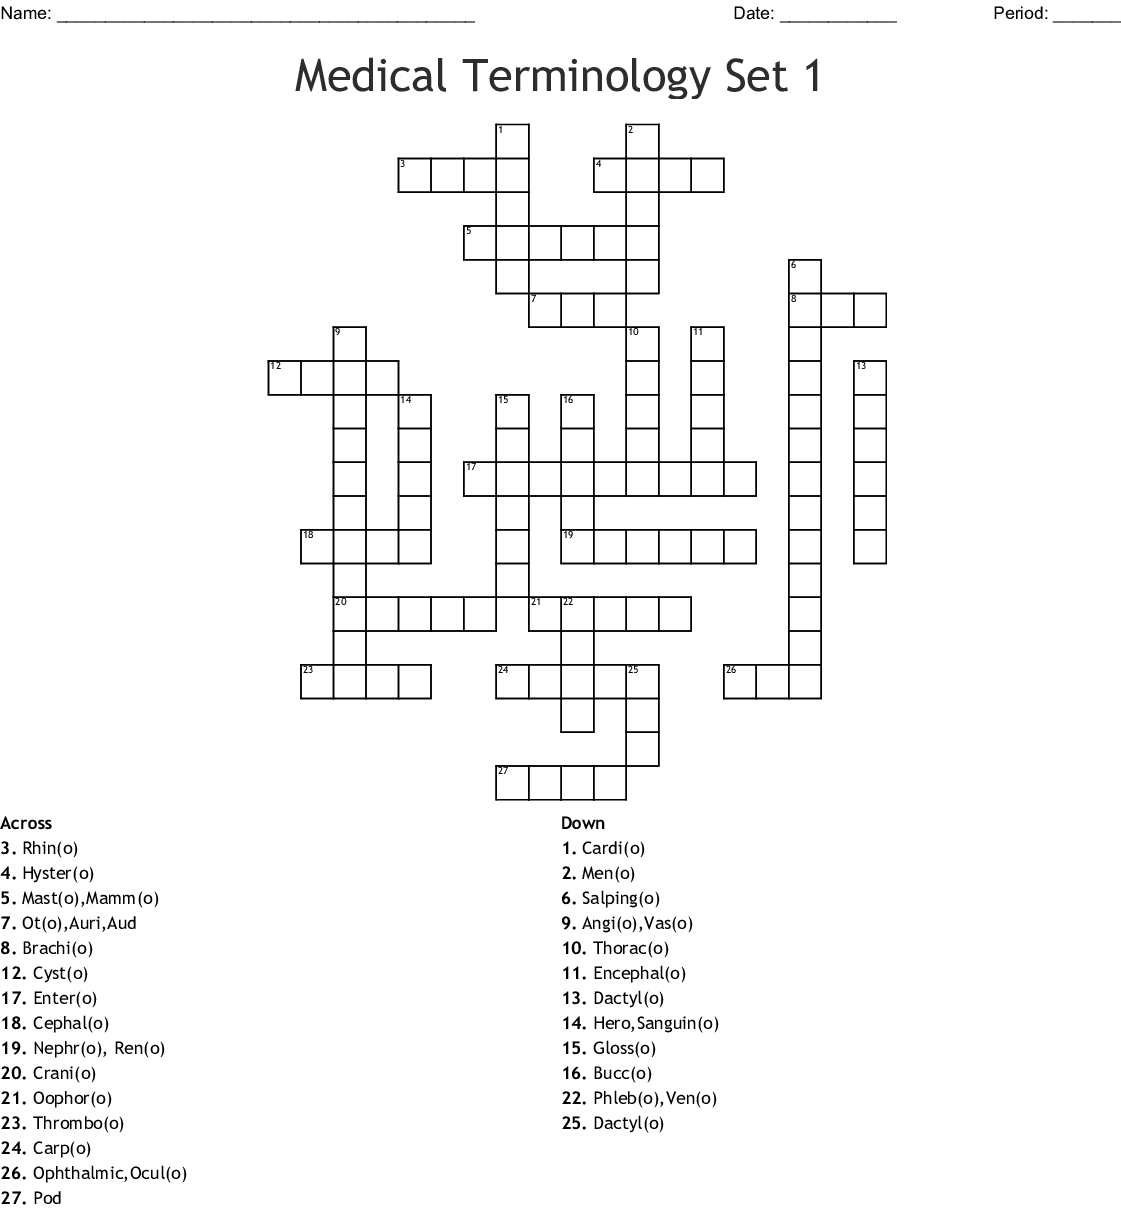 Medical Terminology Set 1 Crossword